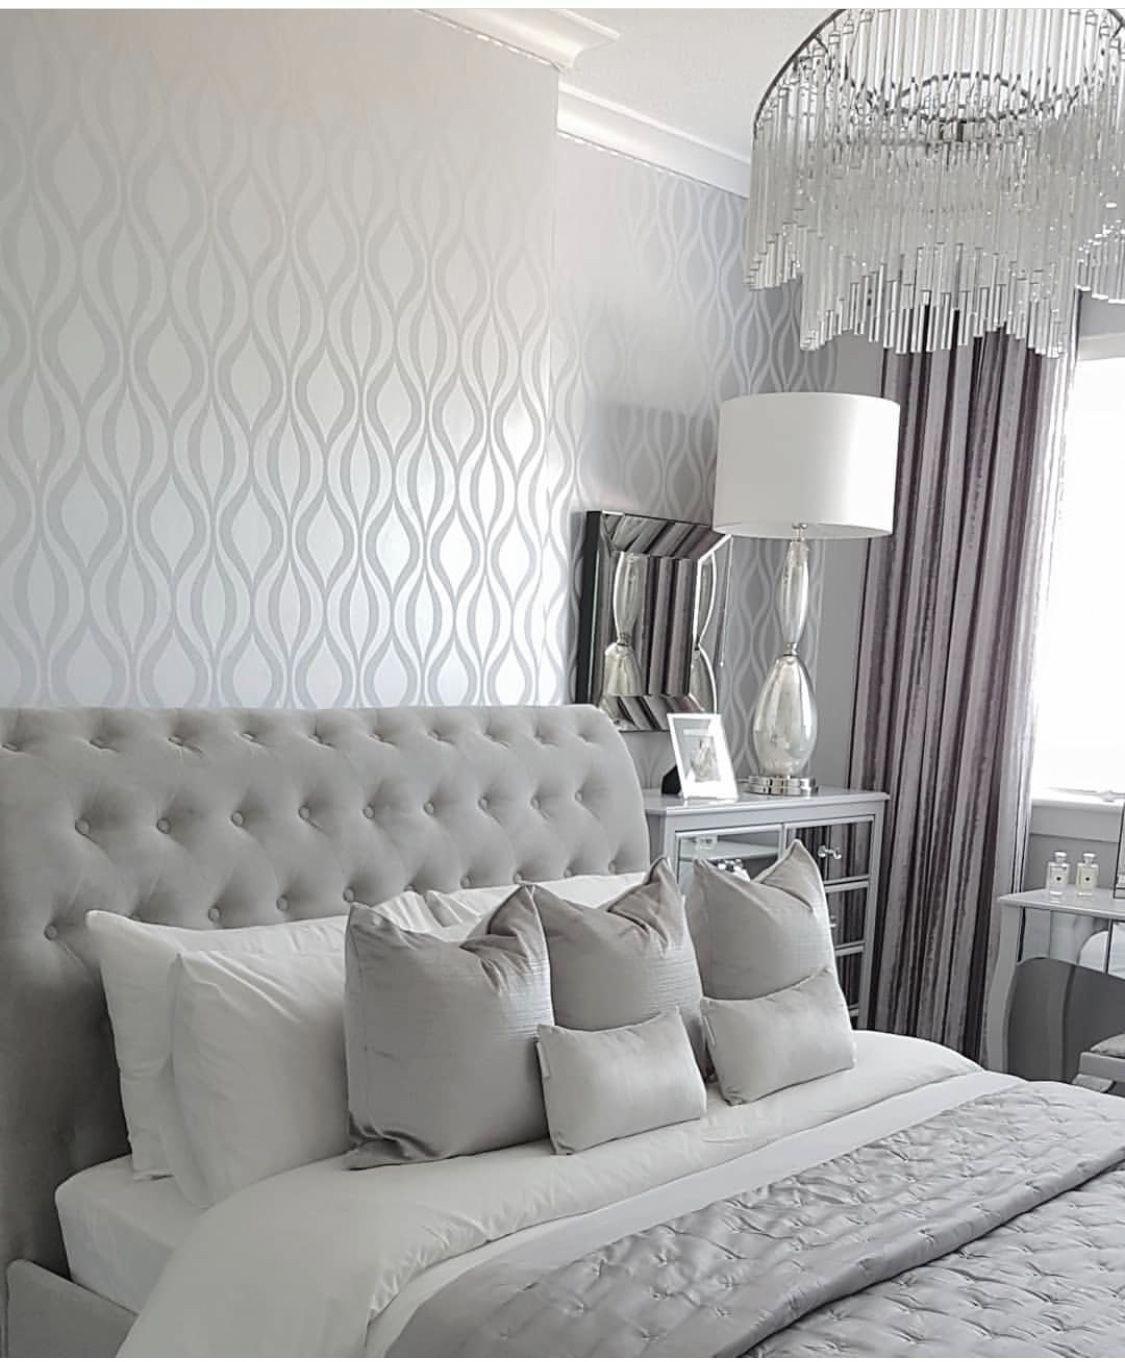 Modern bedroom ideas interior decorating accessories bedroom inspiration ideas 20190126